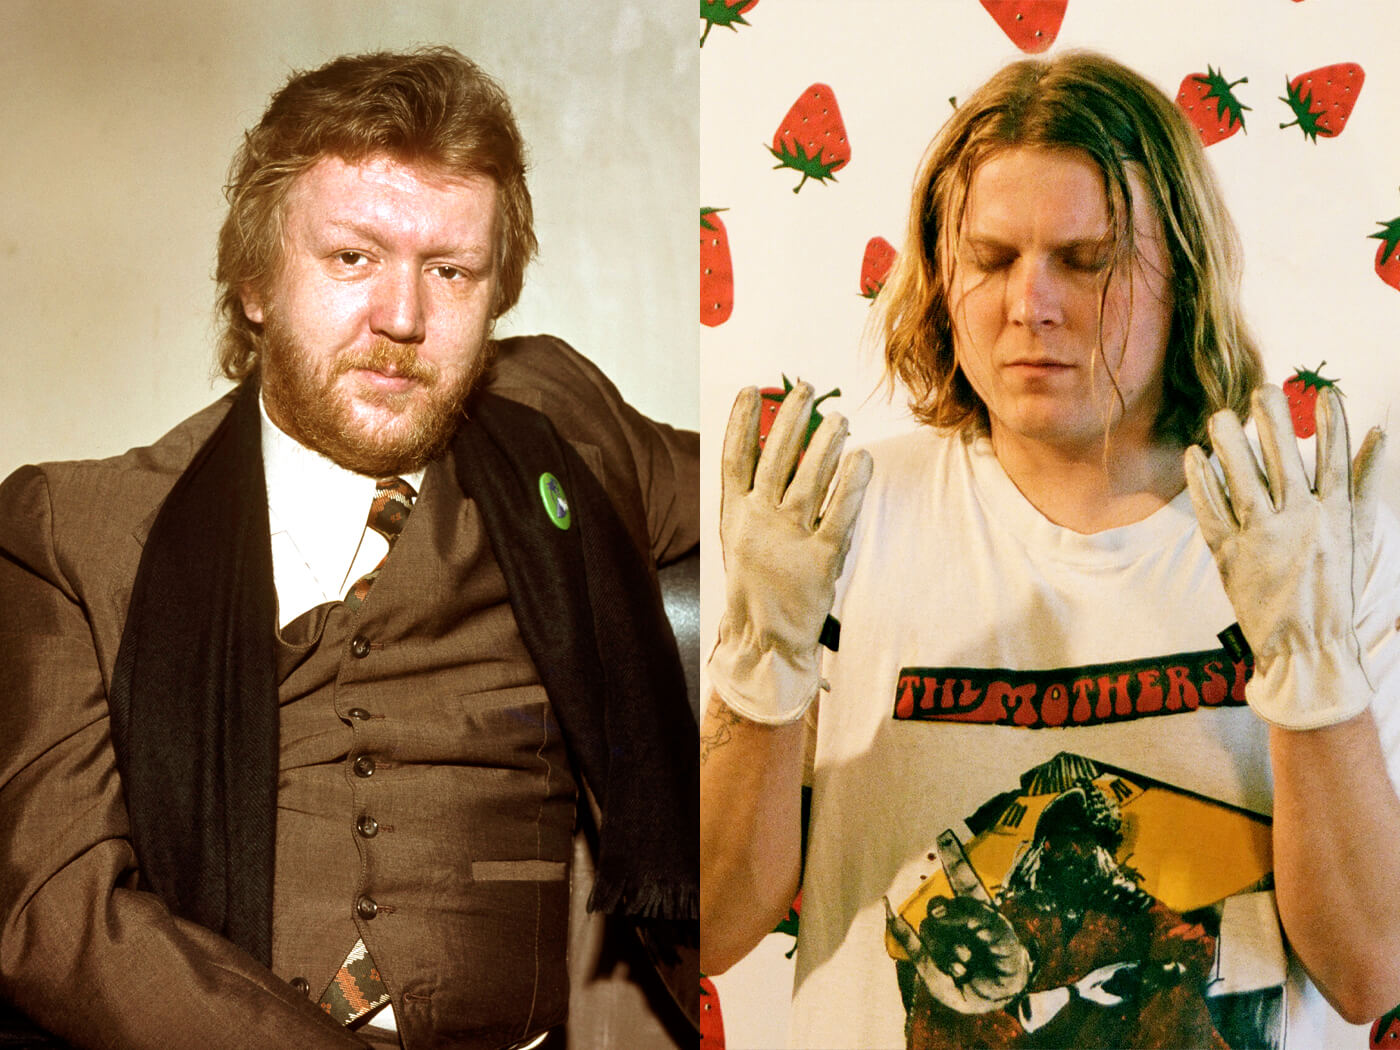 Hear Ty Segall's Harry Nilsson covers album